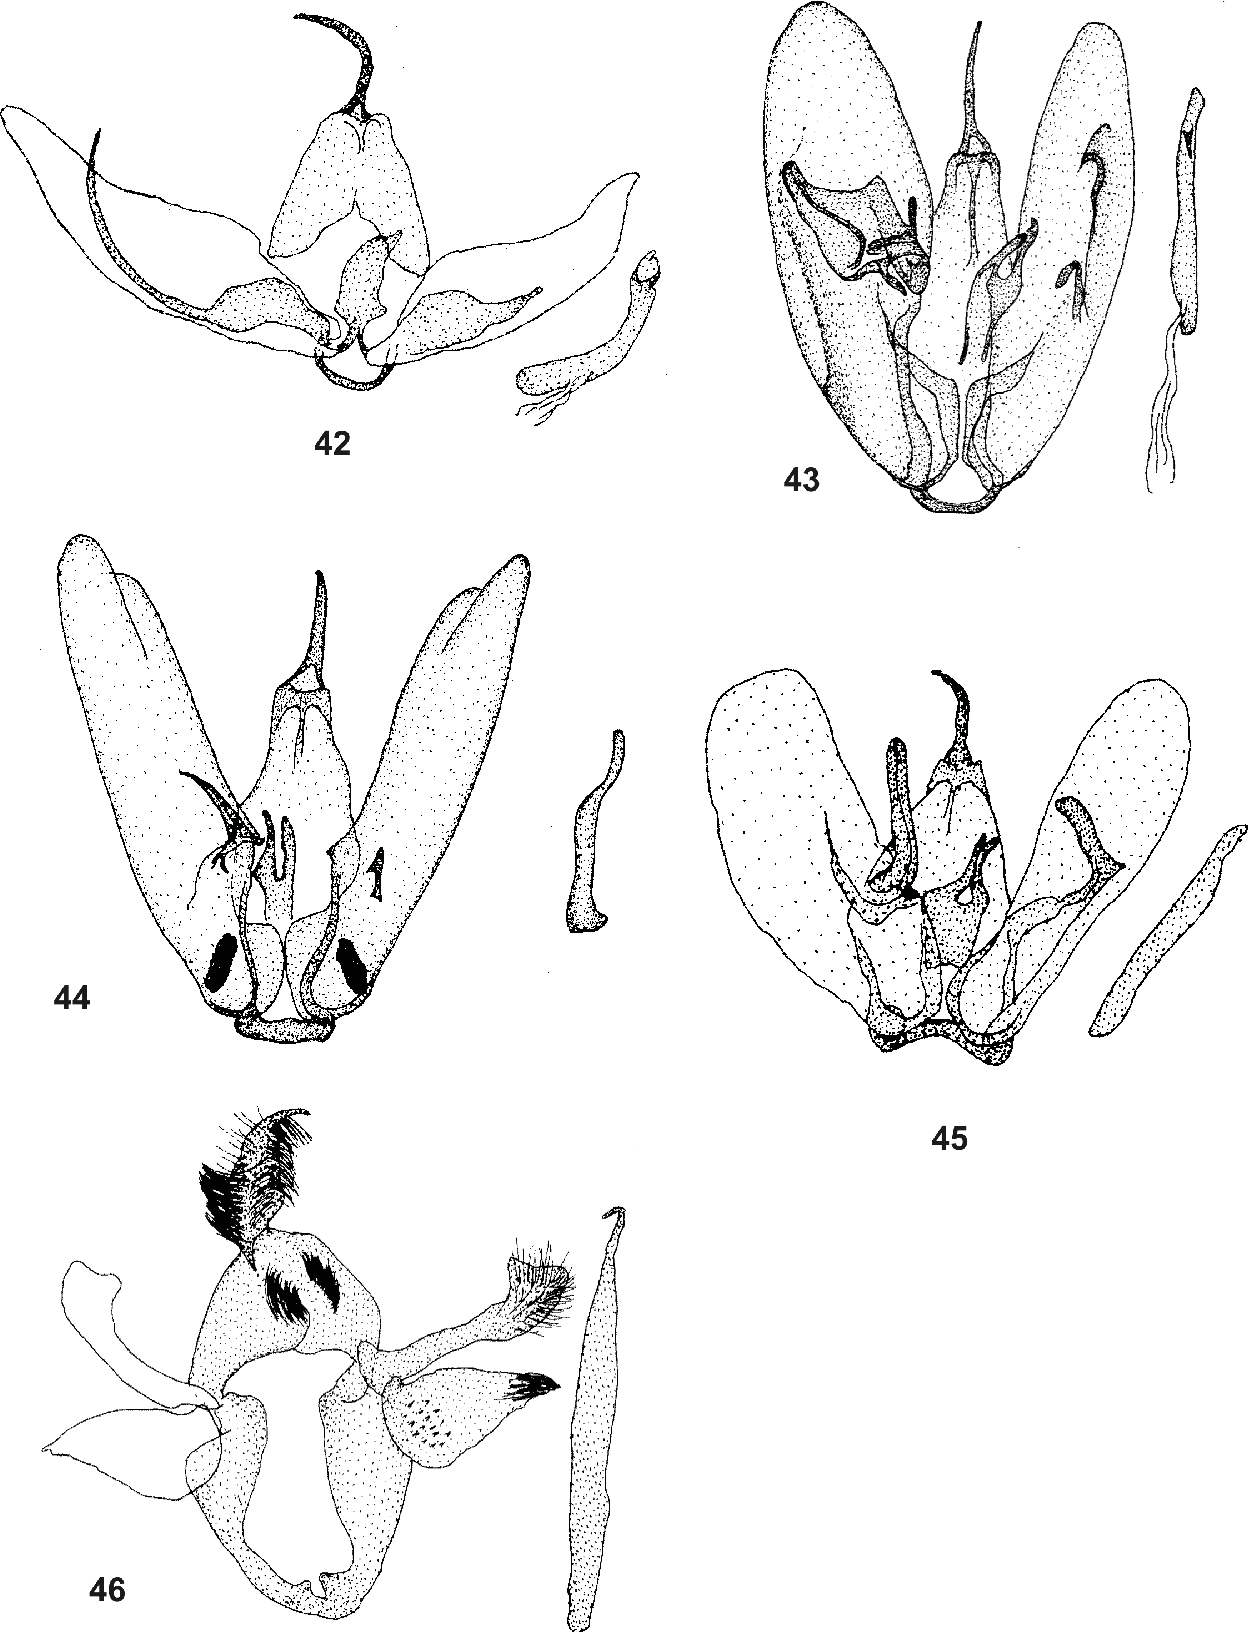 figure 42-46